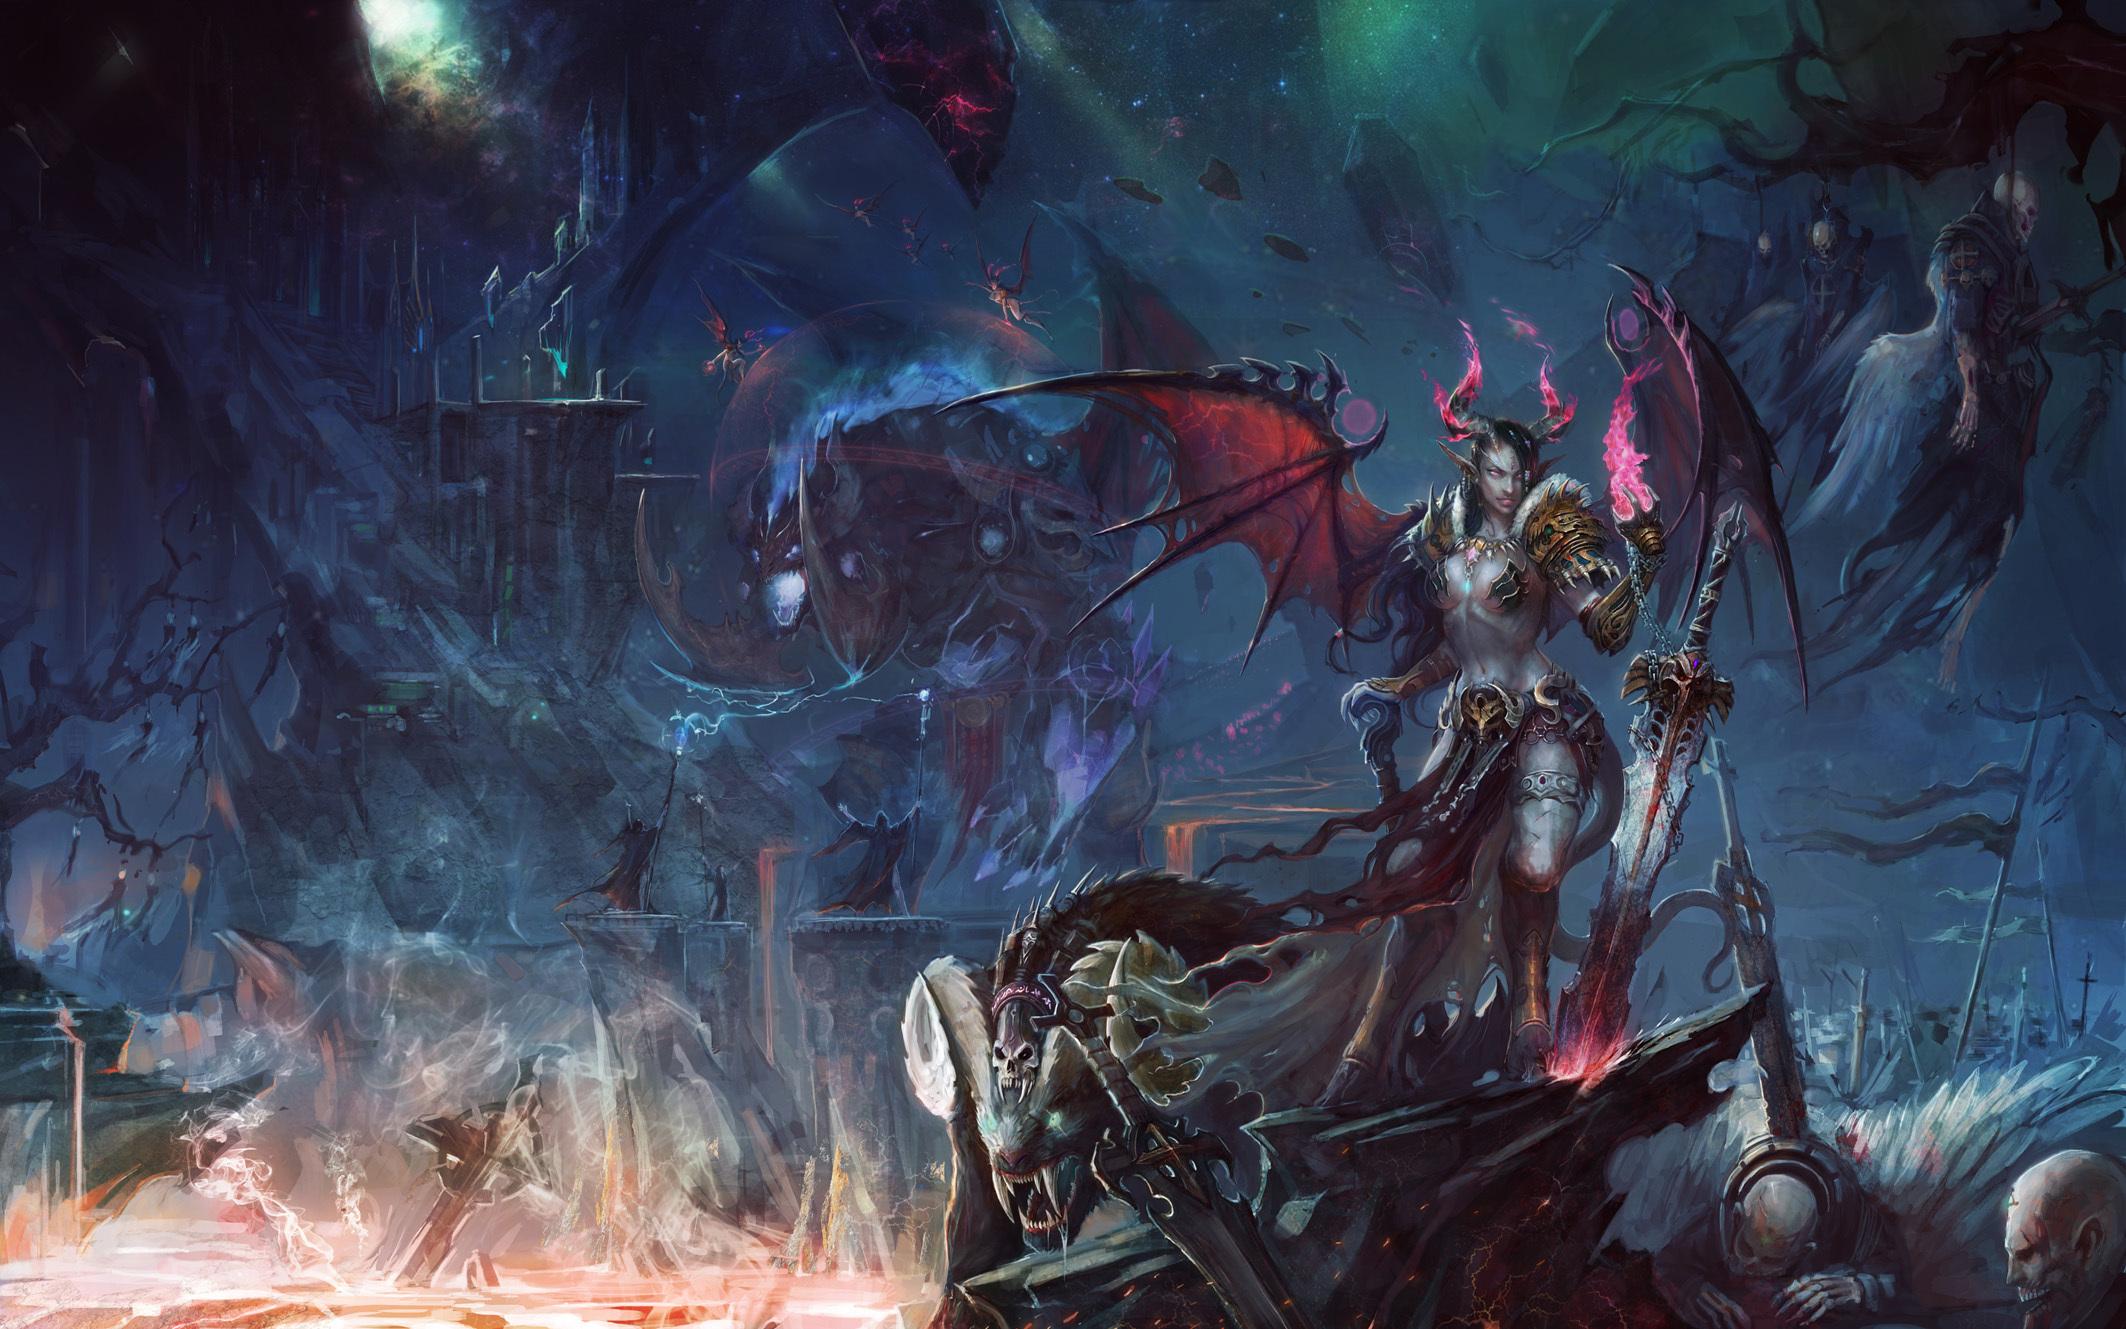 WoW Demons Warriors Swords Games Girls Fantasy warrior wallpaper 2126x1329